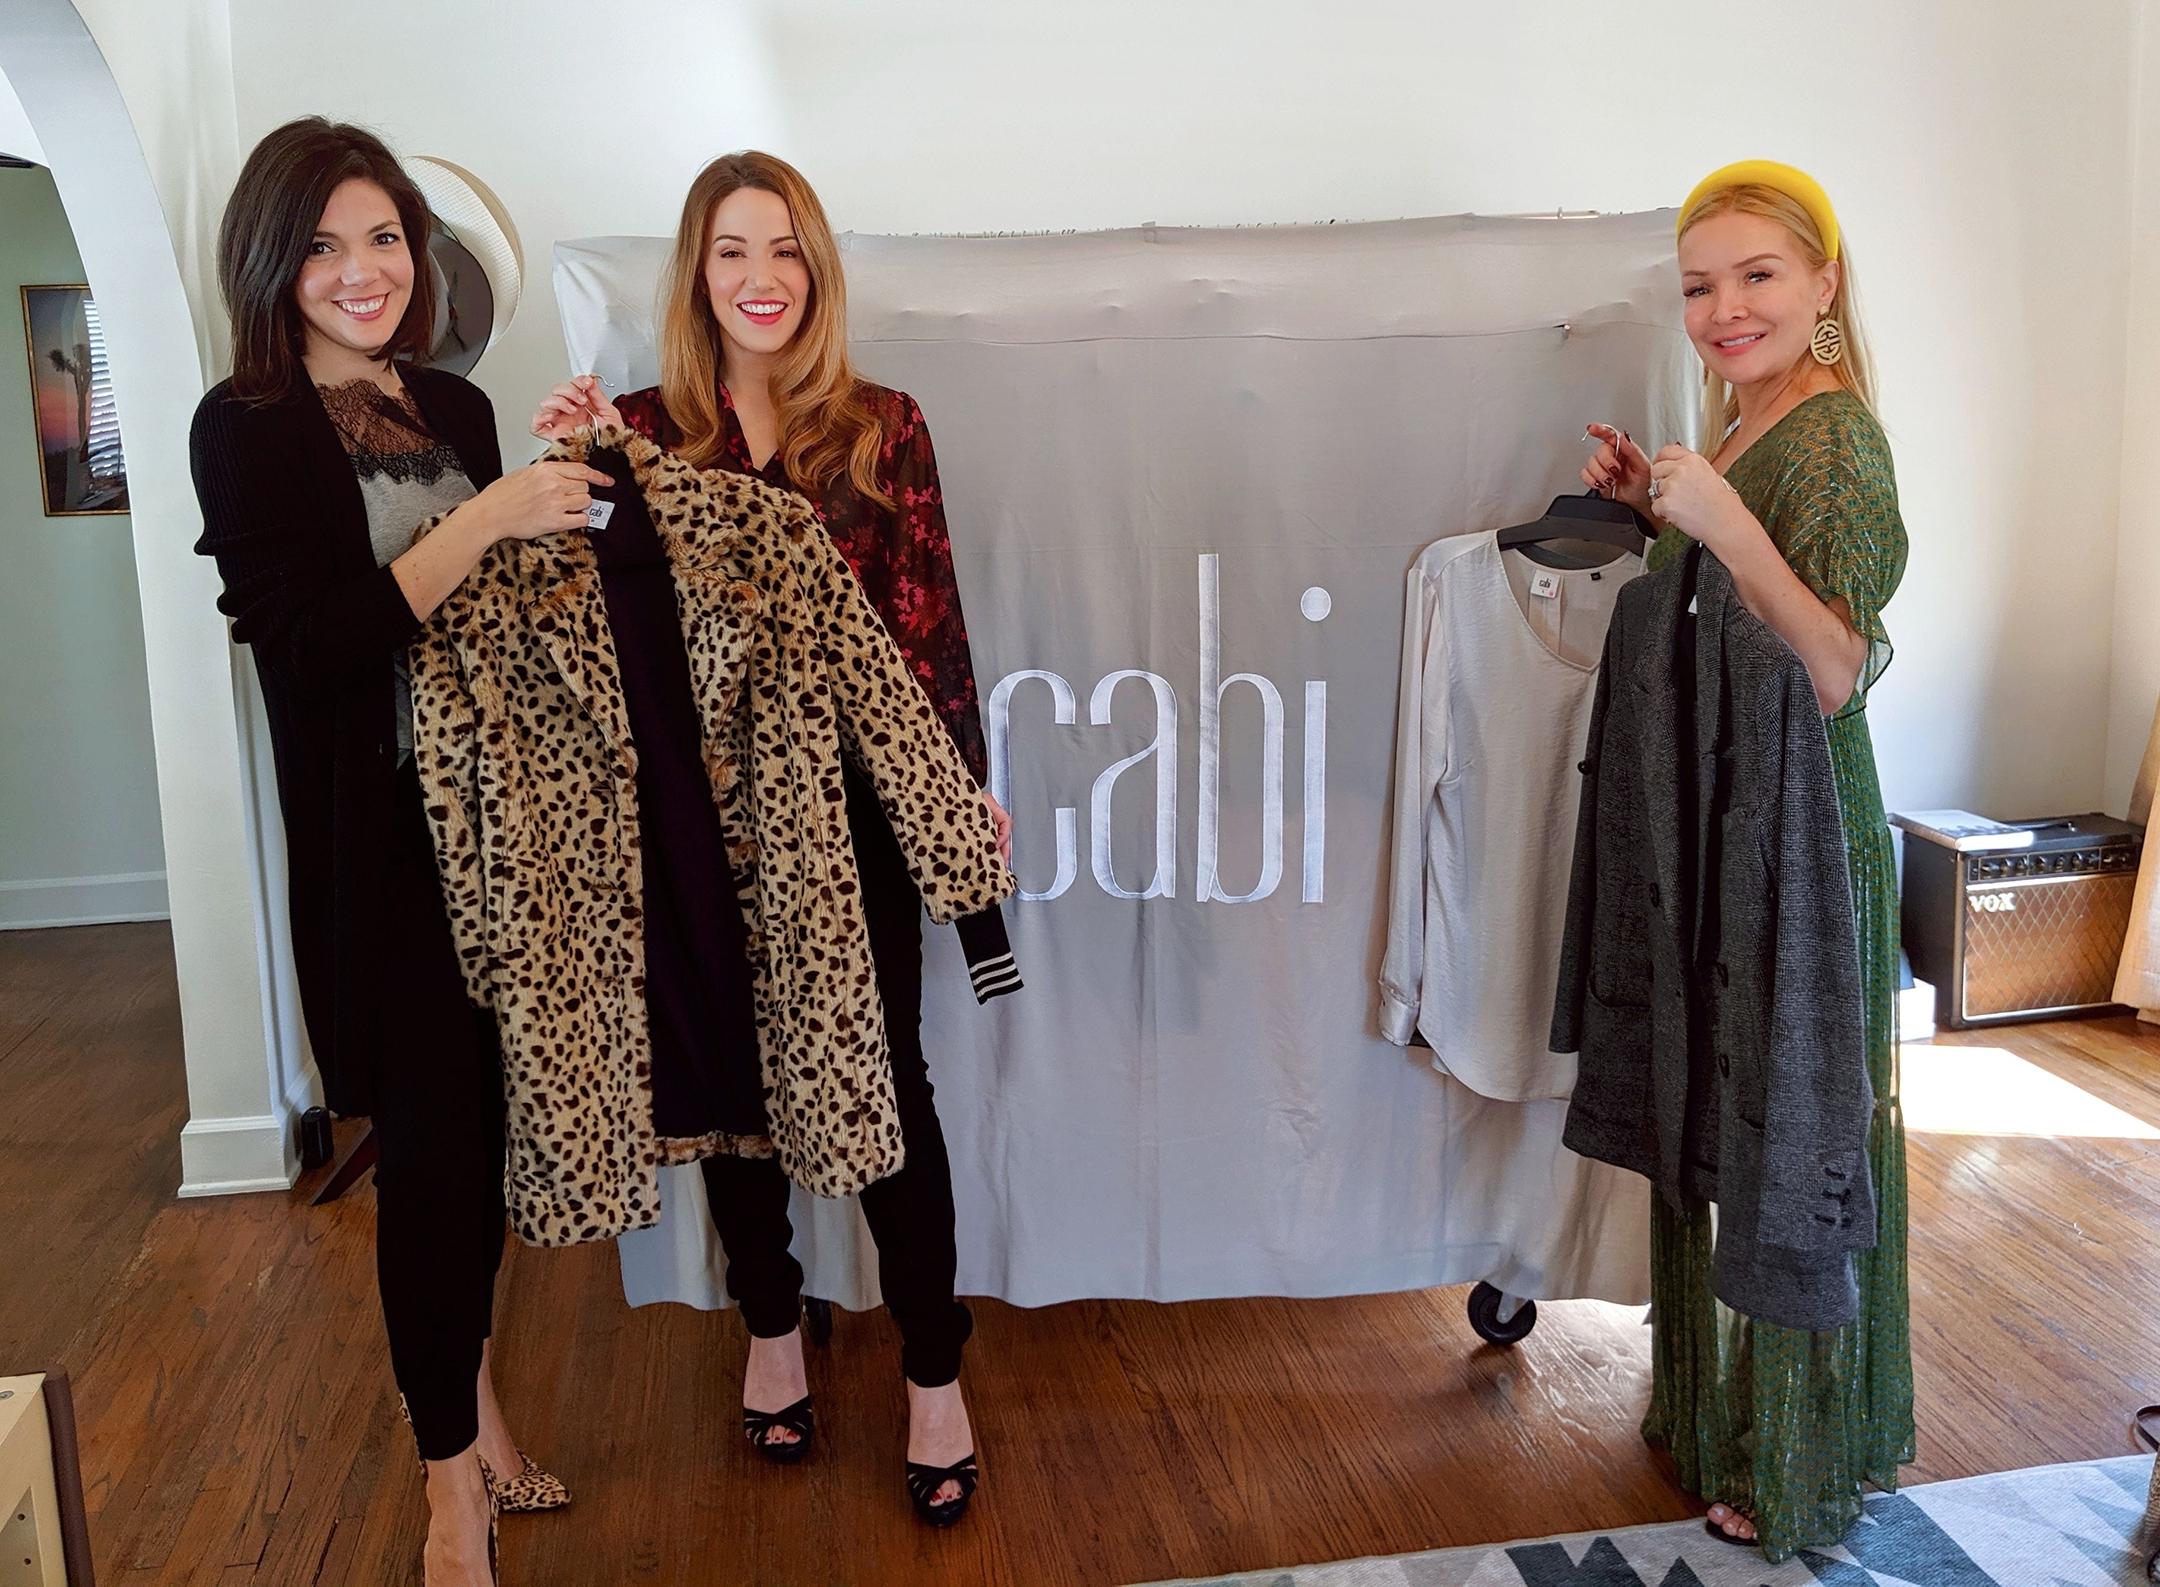 My Amazing cabi Fashion Experience